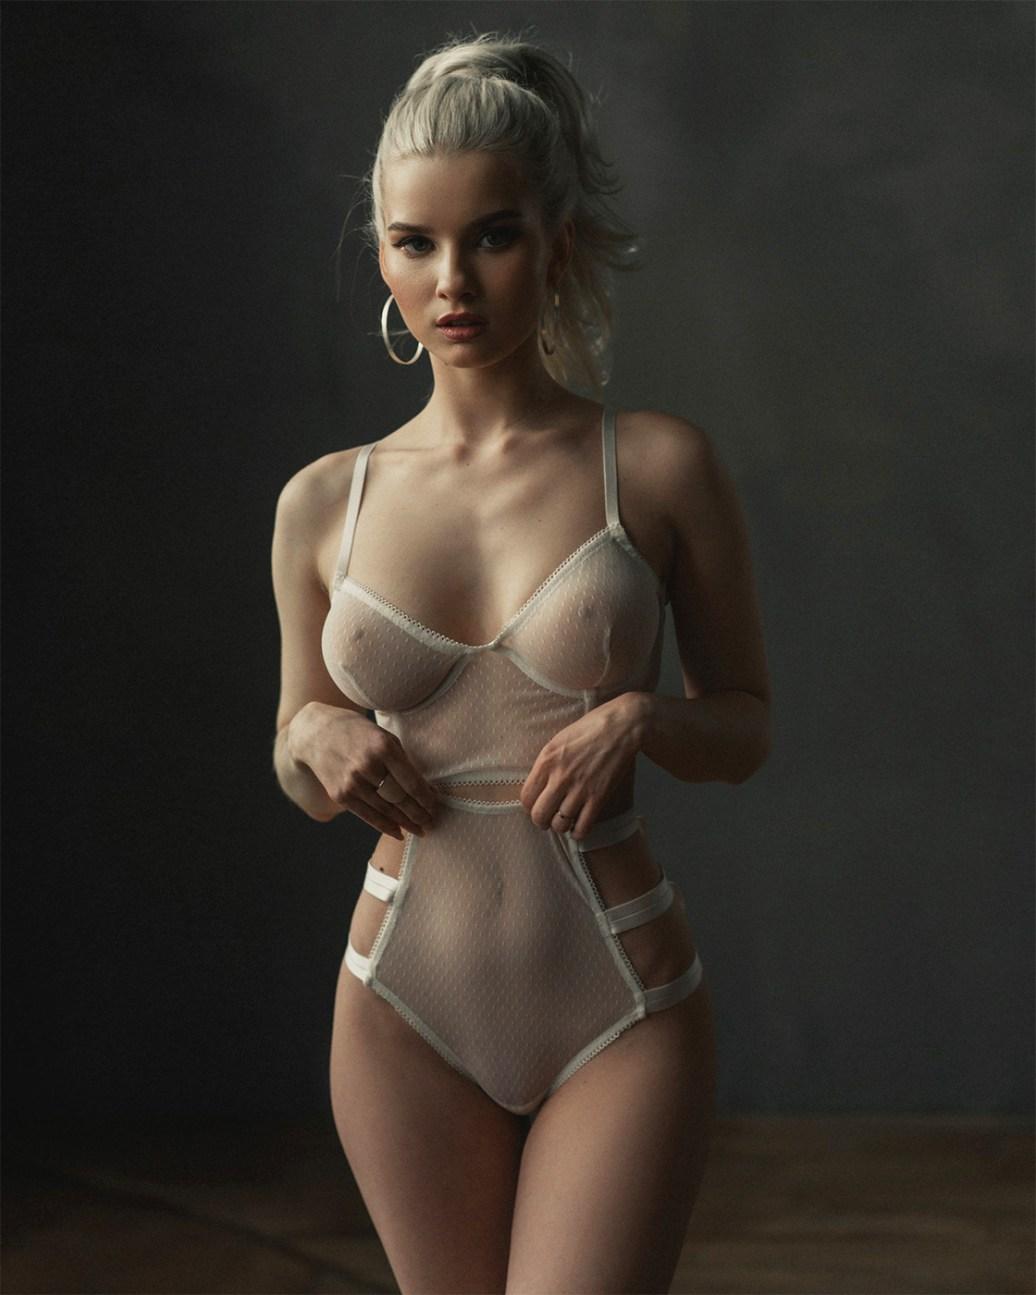 Katerina-Pluchevskaya-by-Stas-Shmel.jpg?